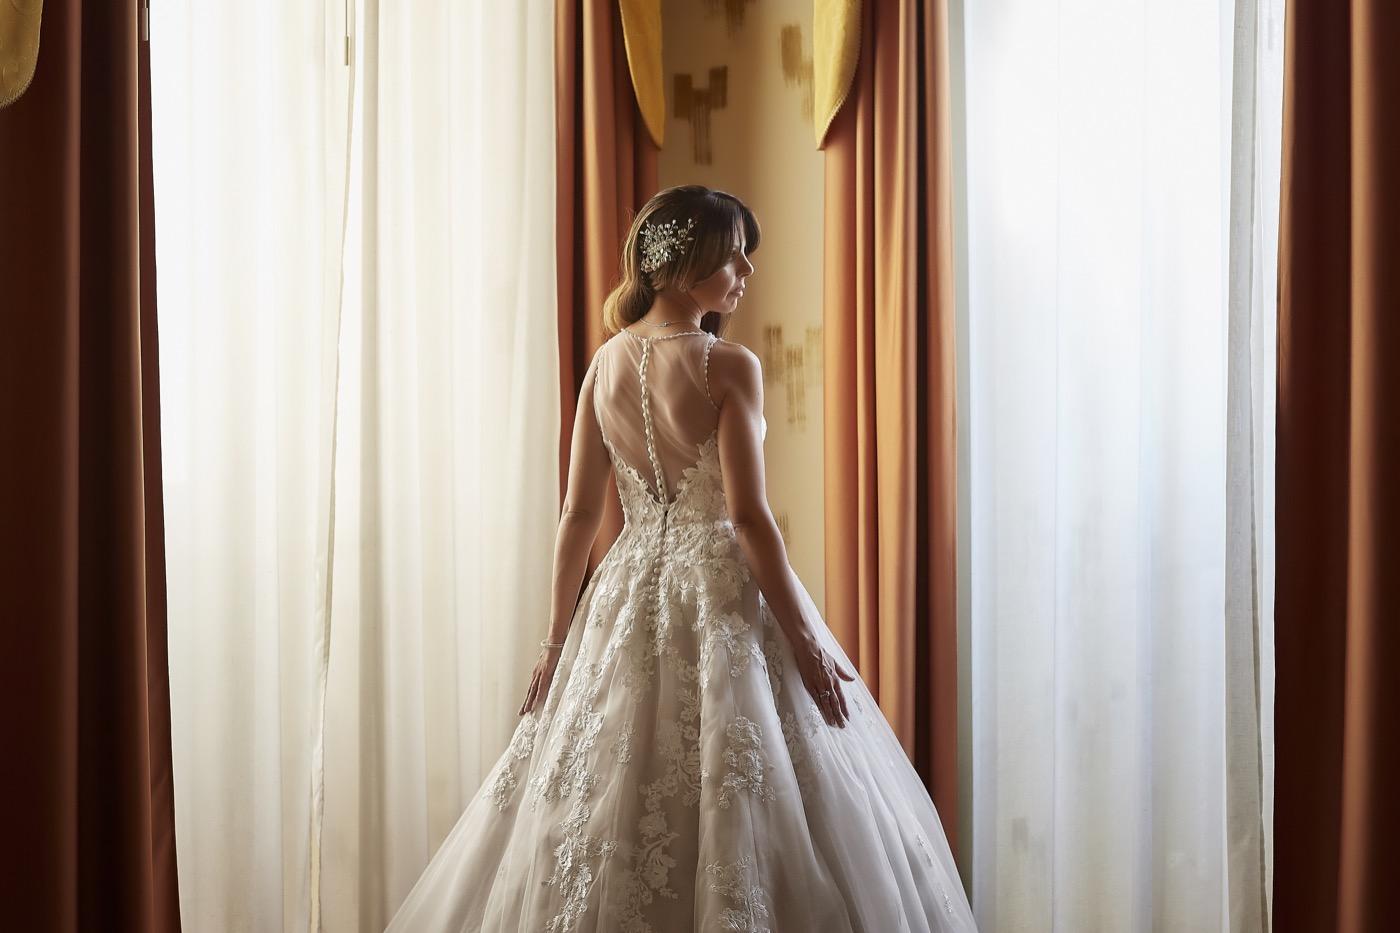 Claudio-Coppola-wedding-photographer-la-scuderia-eventi-preparativi-la-rosetta-perugia-28